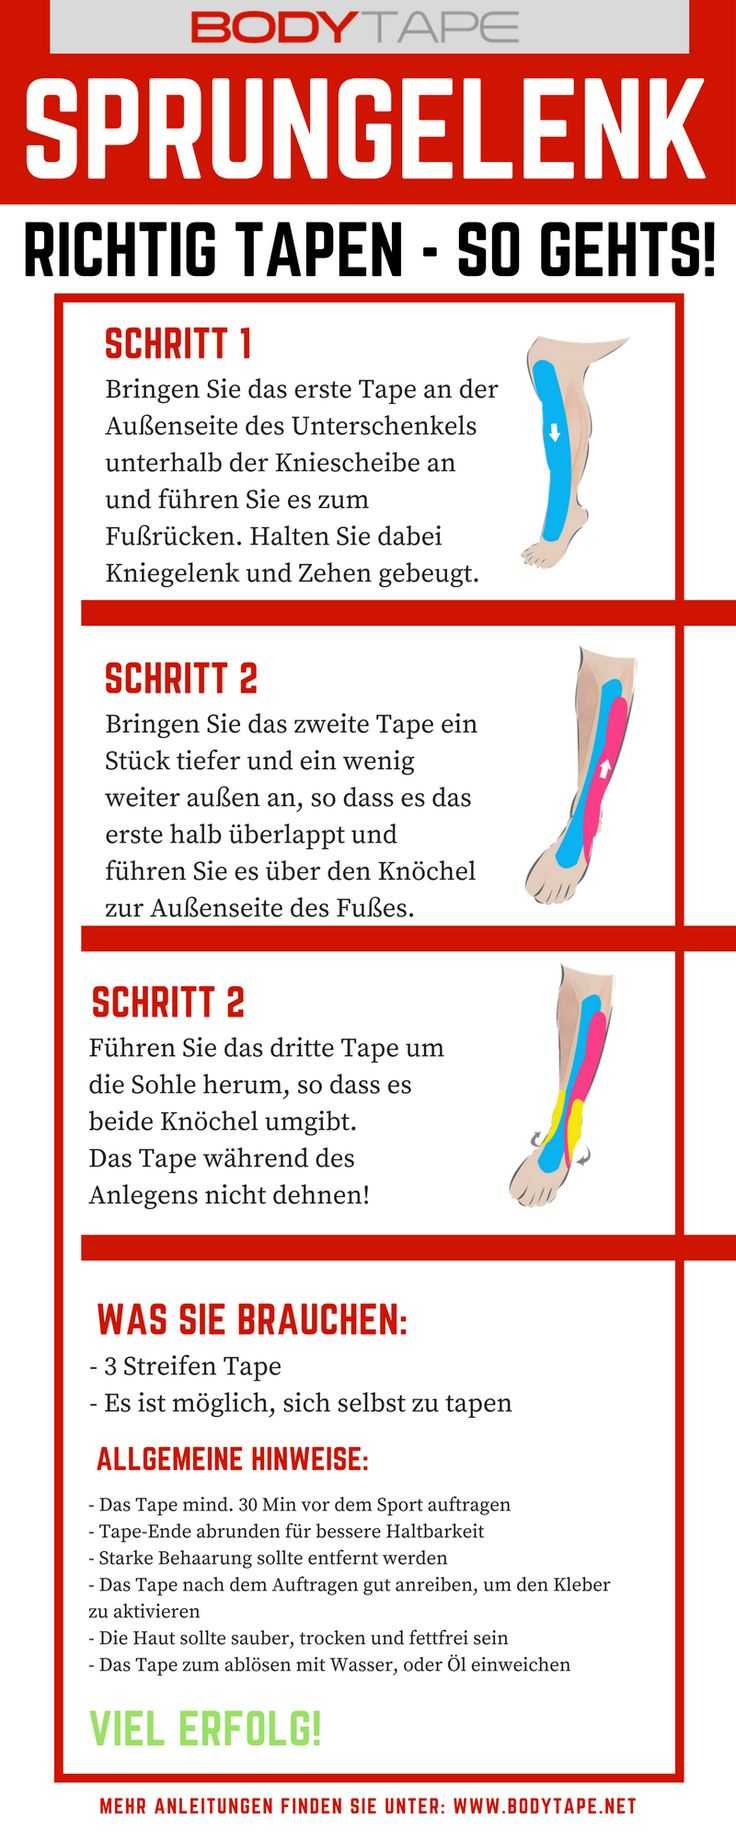 Sprunggelenk richtig Tapen - Kinesiologie Tape Anleitung für das Sprunggelenk.  Mehr Anleitungen unter: www.taping-guide.com